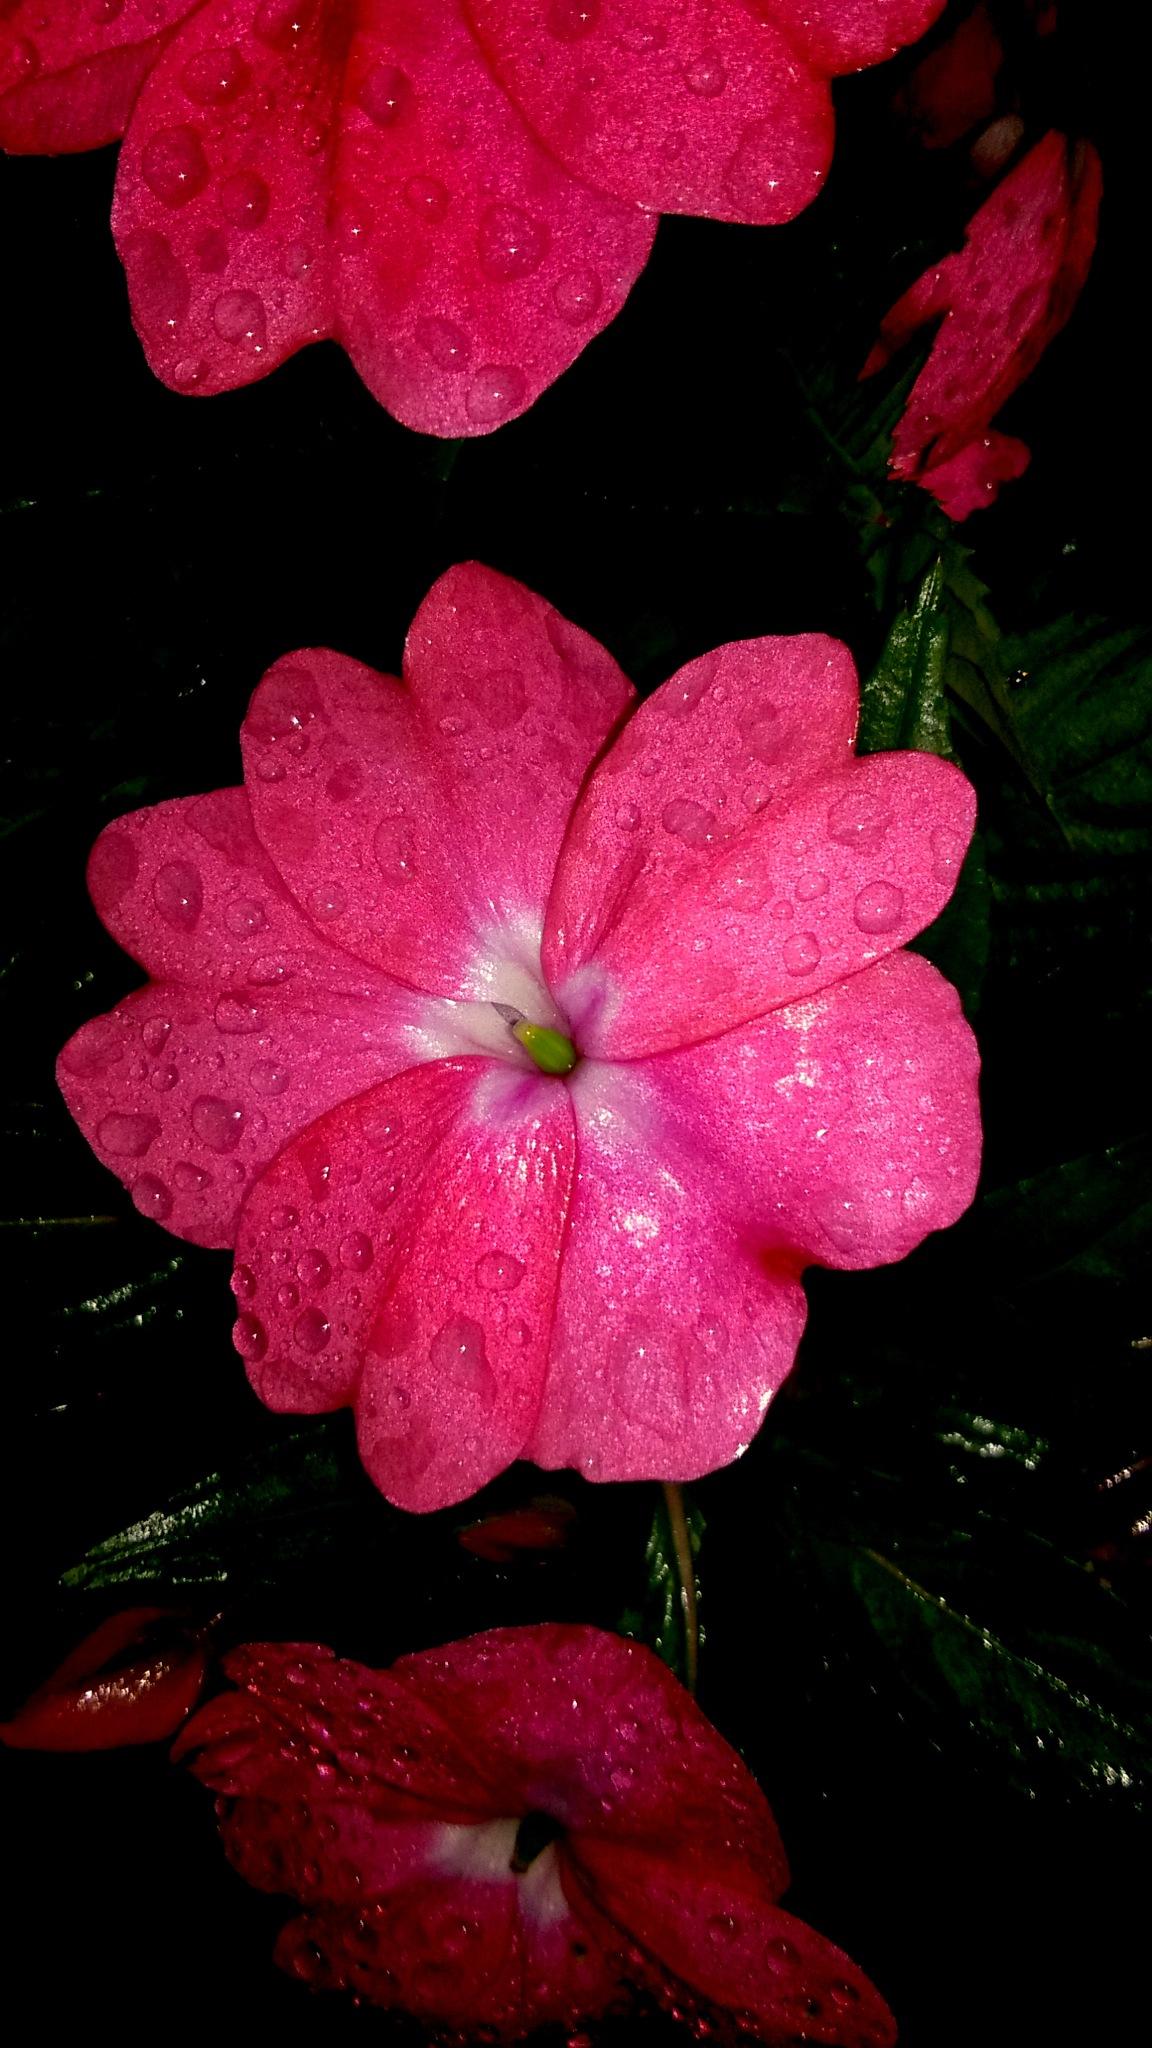 Flowers by souvikit